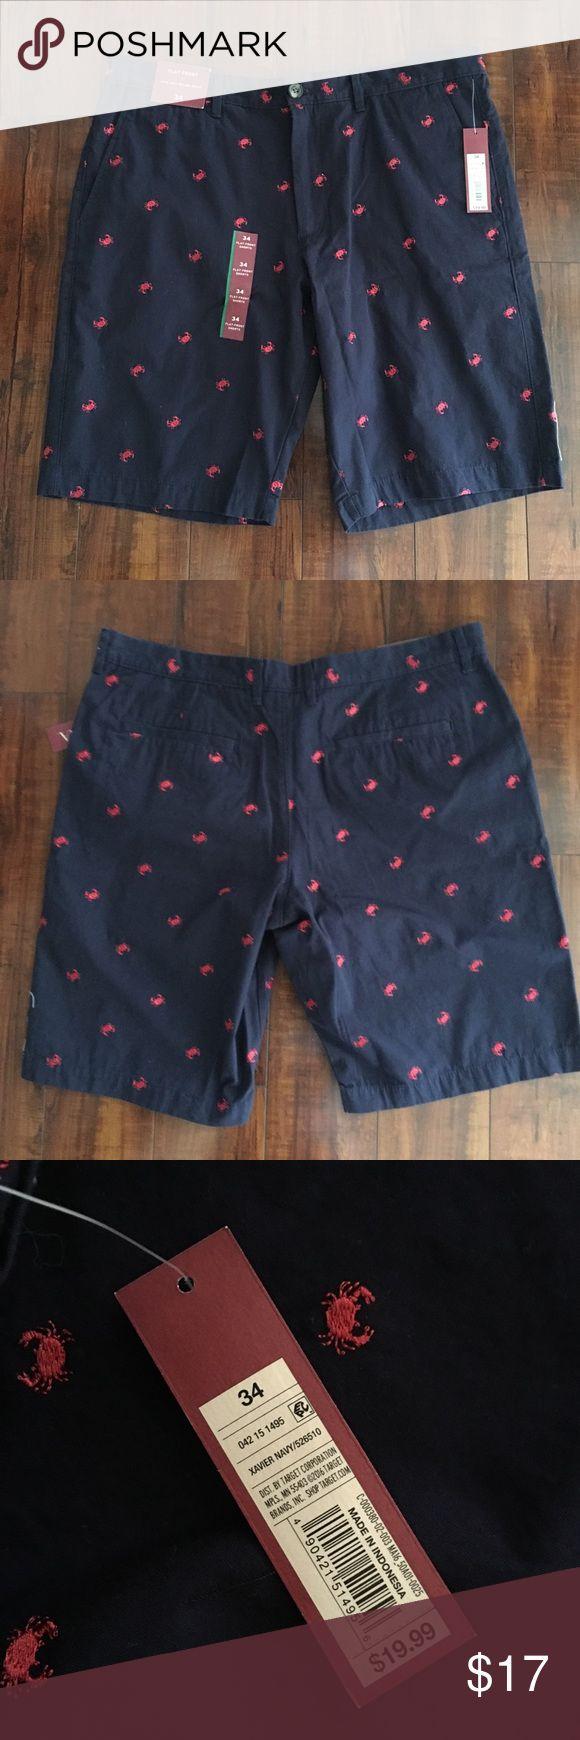 NWT Merona Men's Khaki Shorts Blue, Red Crab Sz 34 NWT Men's Merona Khaki Shorts. Navy Blue with Red Crab Logo Pattern. 100% Cotton, Size 34. Excellent Condition, no flaws. MSRP $19.99 Merona Shorts Flat Front